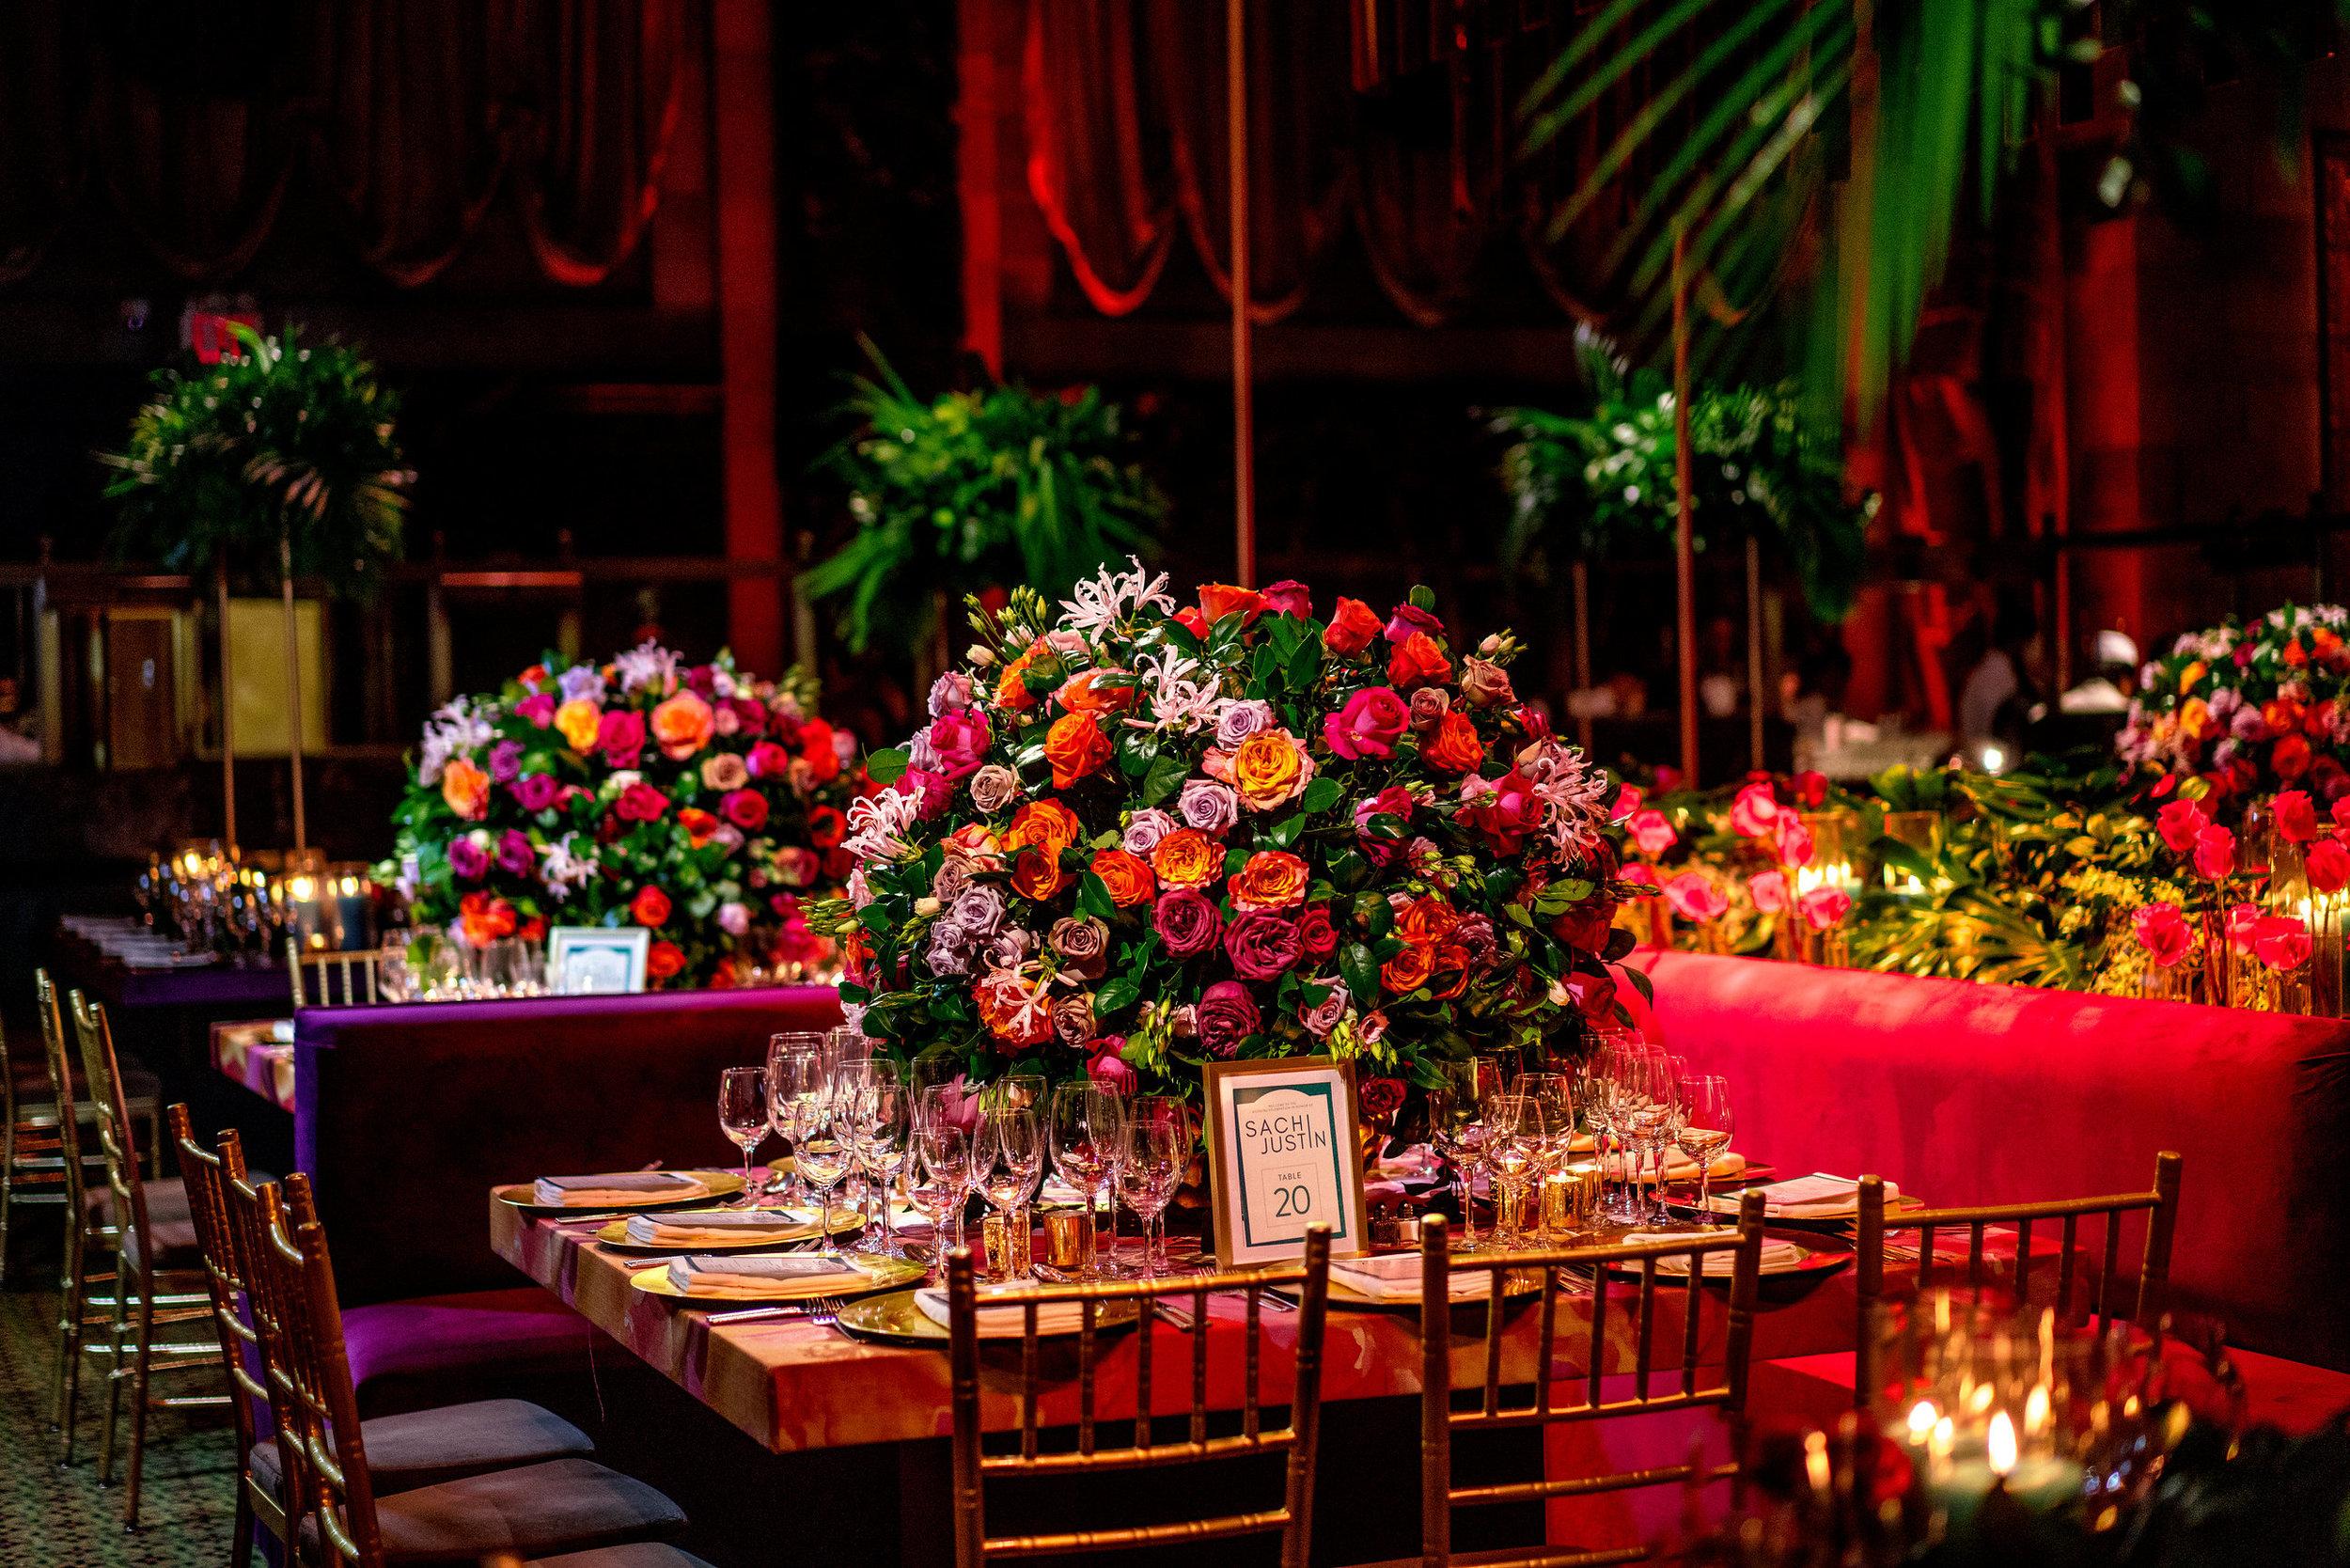 INDIAN WEDDING FLOWER CENTERPIECE DECOR.JPG